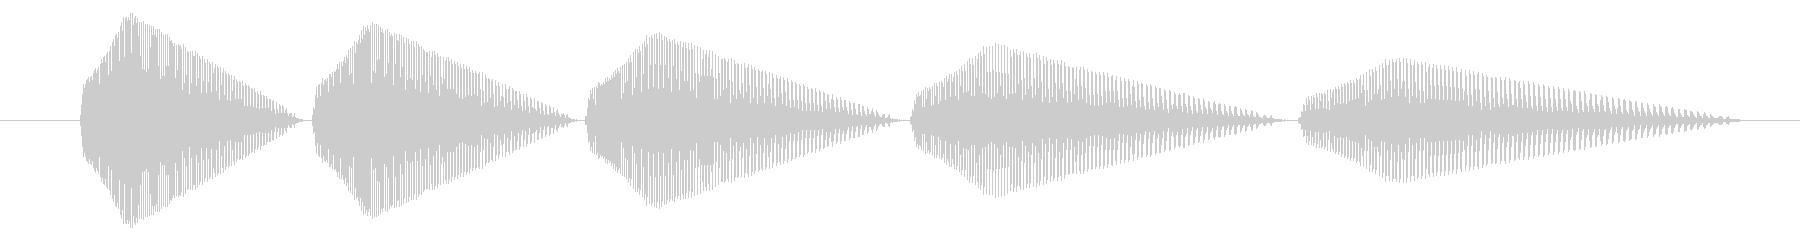 SNES-アクション01-13(倒す)の未再生の波形